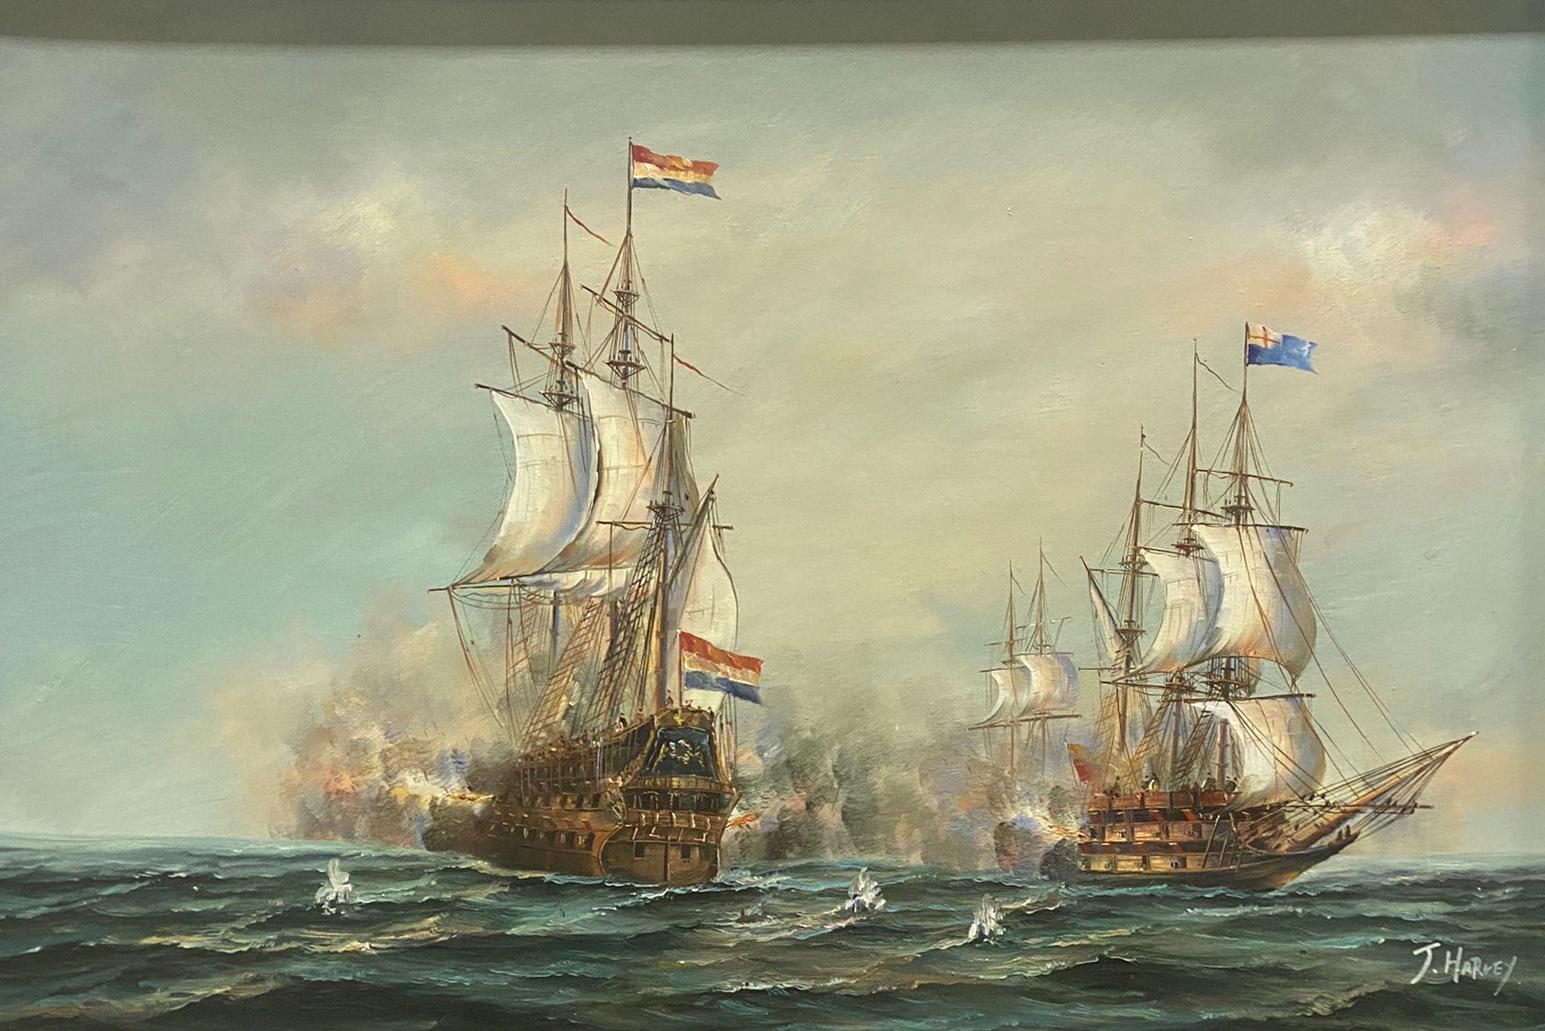 J Harvey, Naval battle